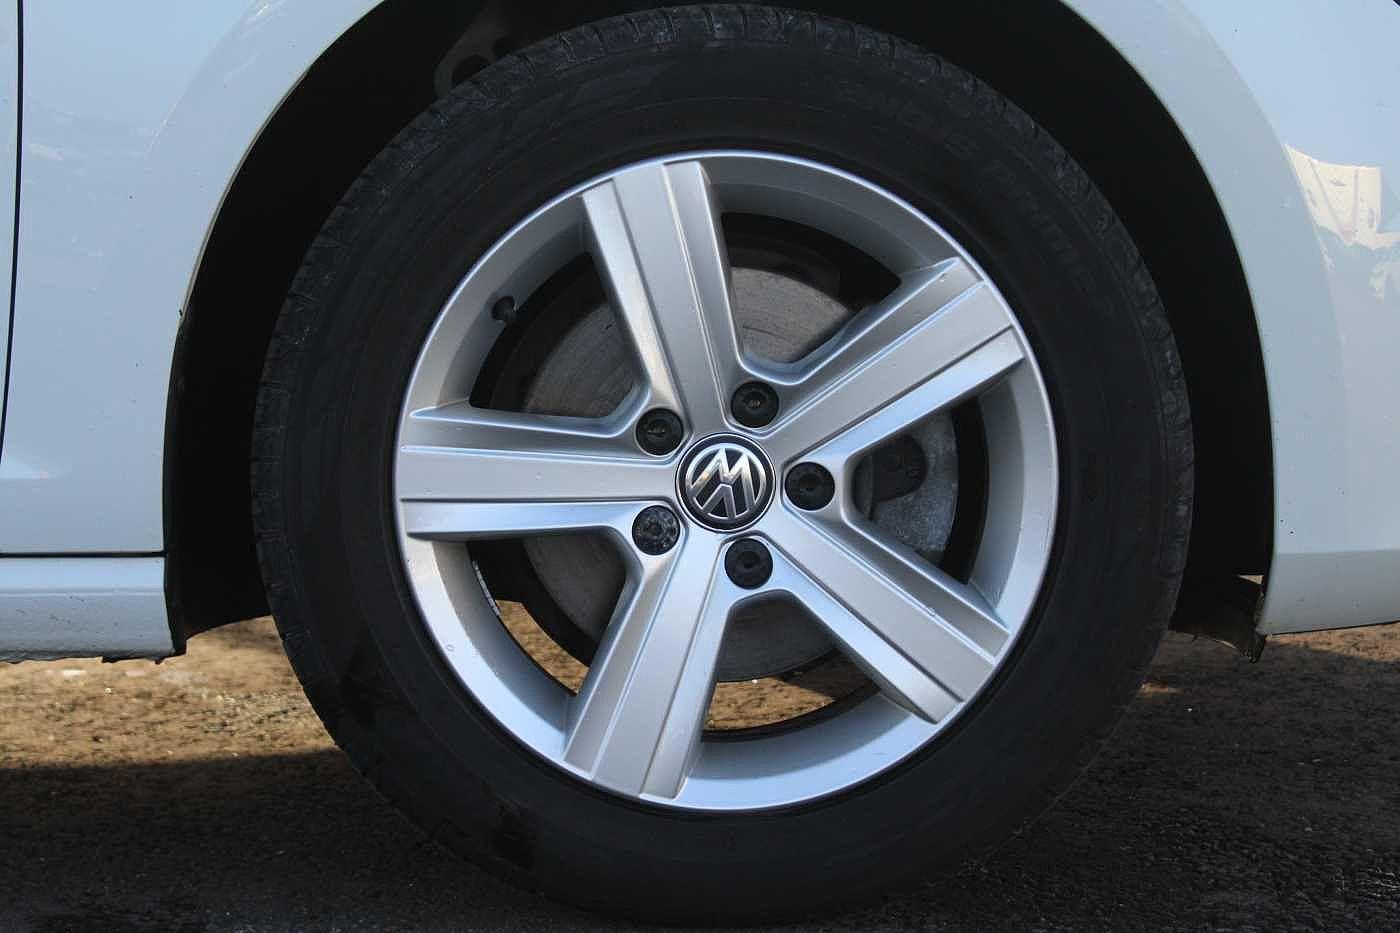 Volkswagen Golf 1.4 TSI Match Edition BMT (125 PS) 5-Dr